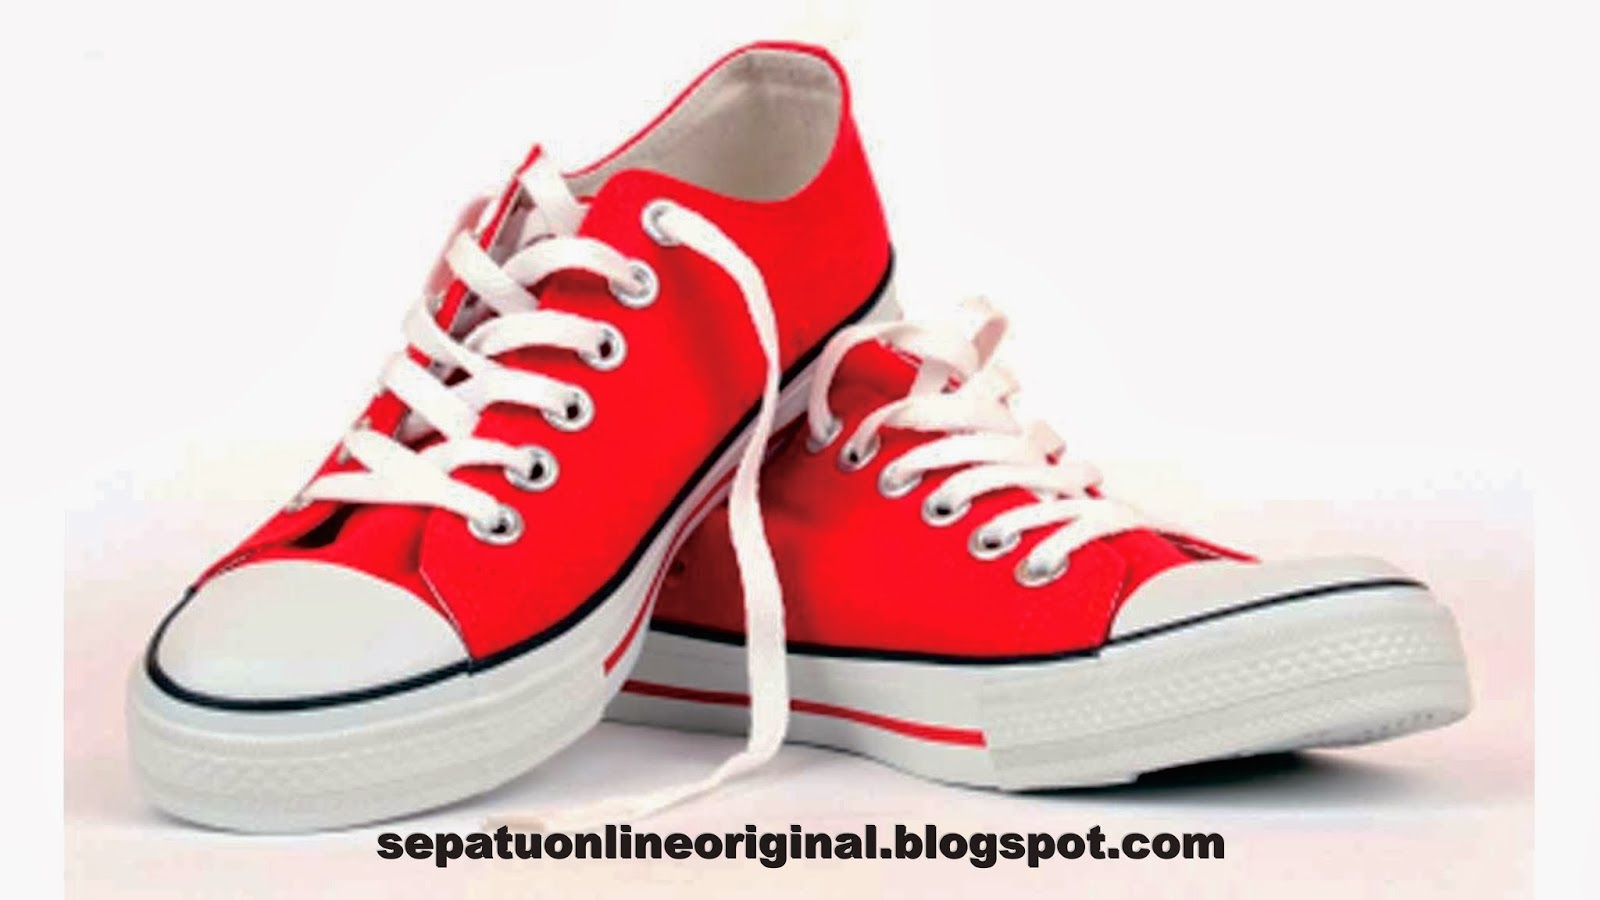 Sepatu Online Shop 6458c652d3